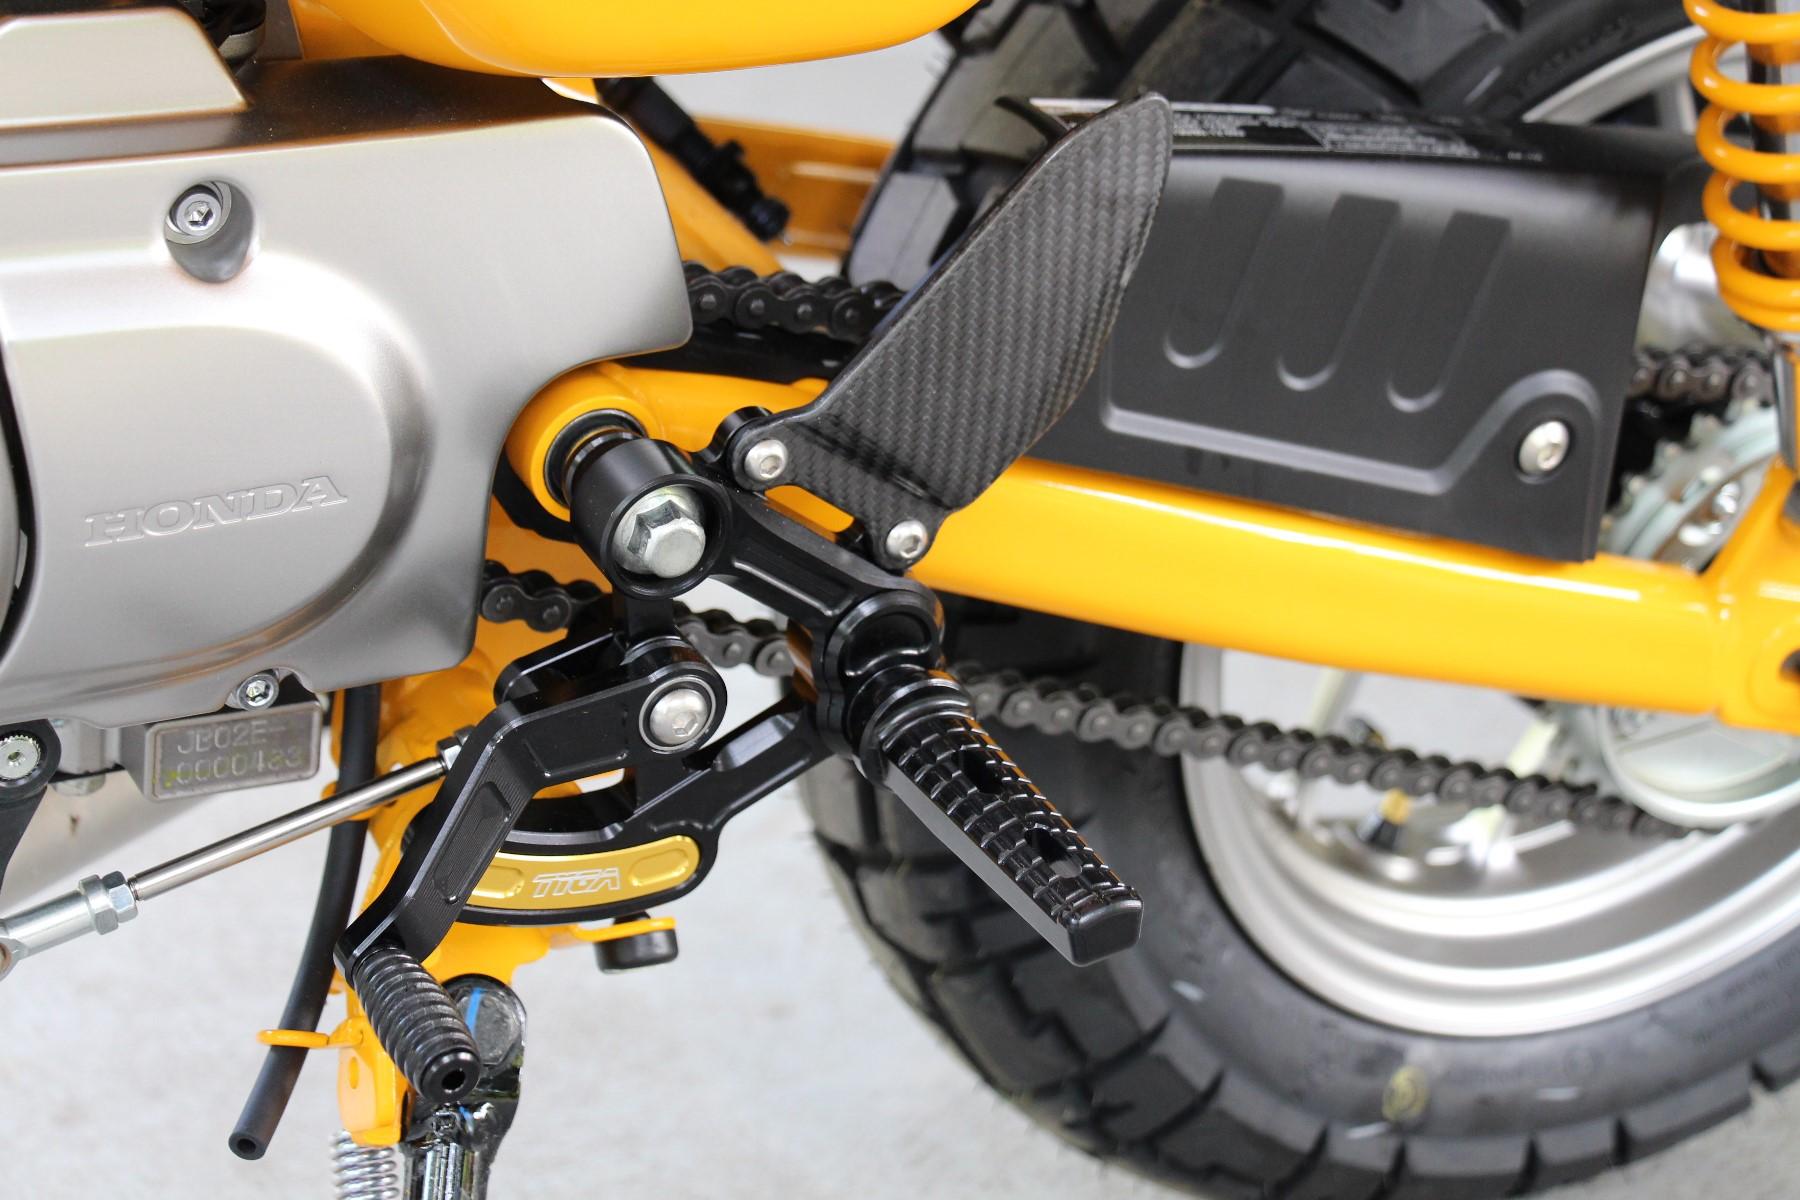 Racing Rear Set Kit Adjustable Black Monkey 125 Jap4performance